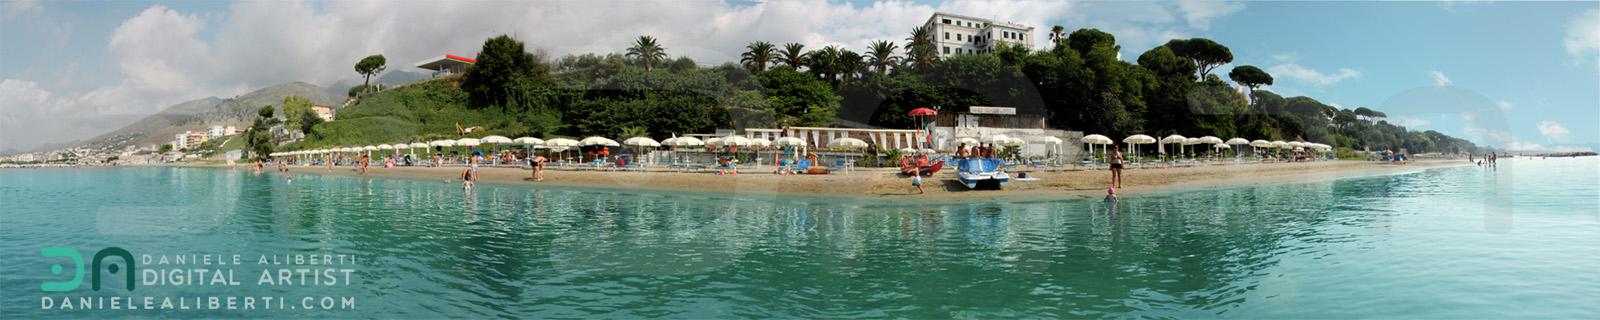 Sea_Italy_Landscape_L_2K